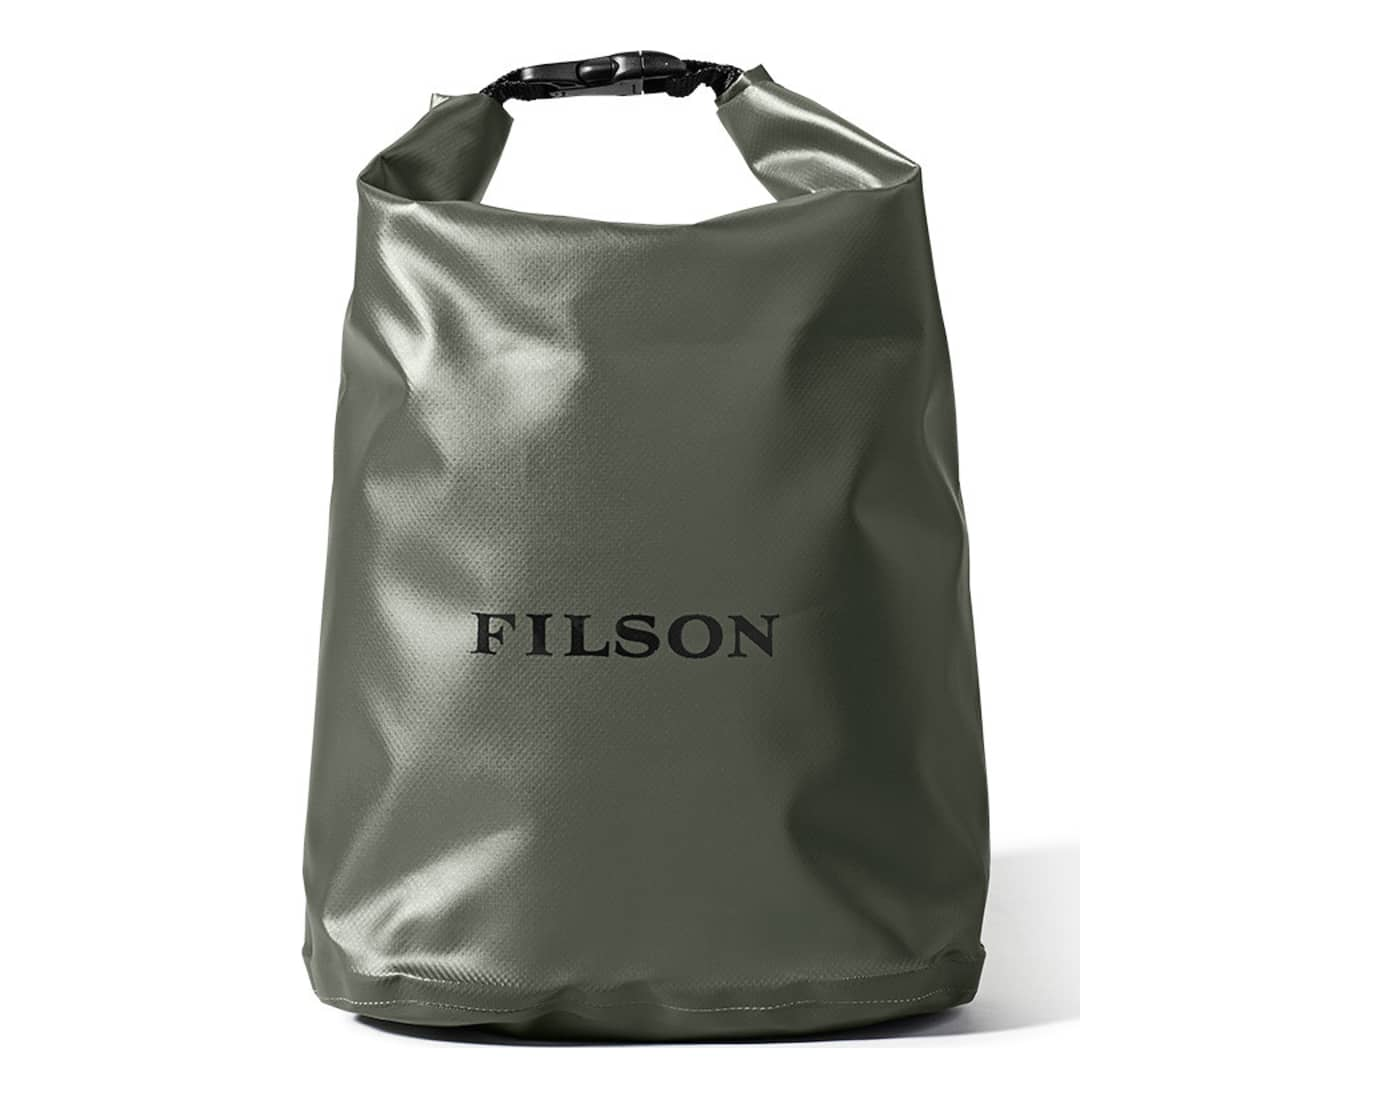 Filson 90132 Dry Bag Small Green